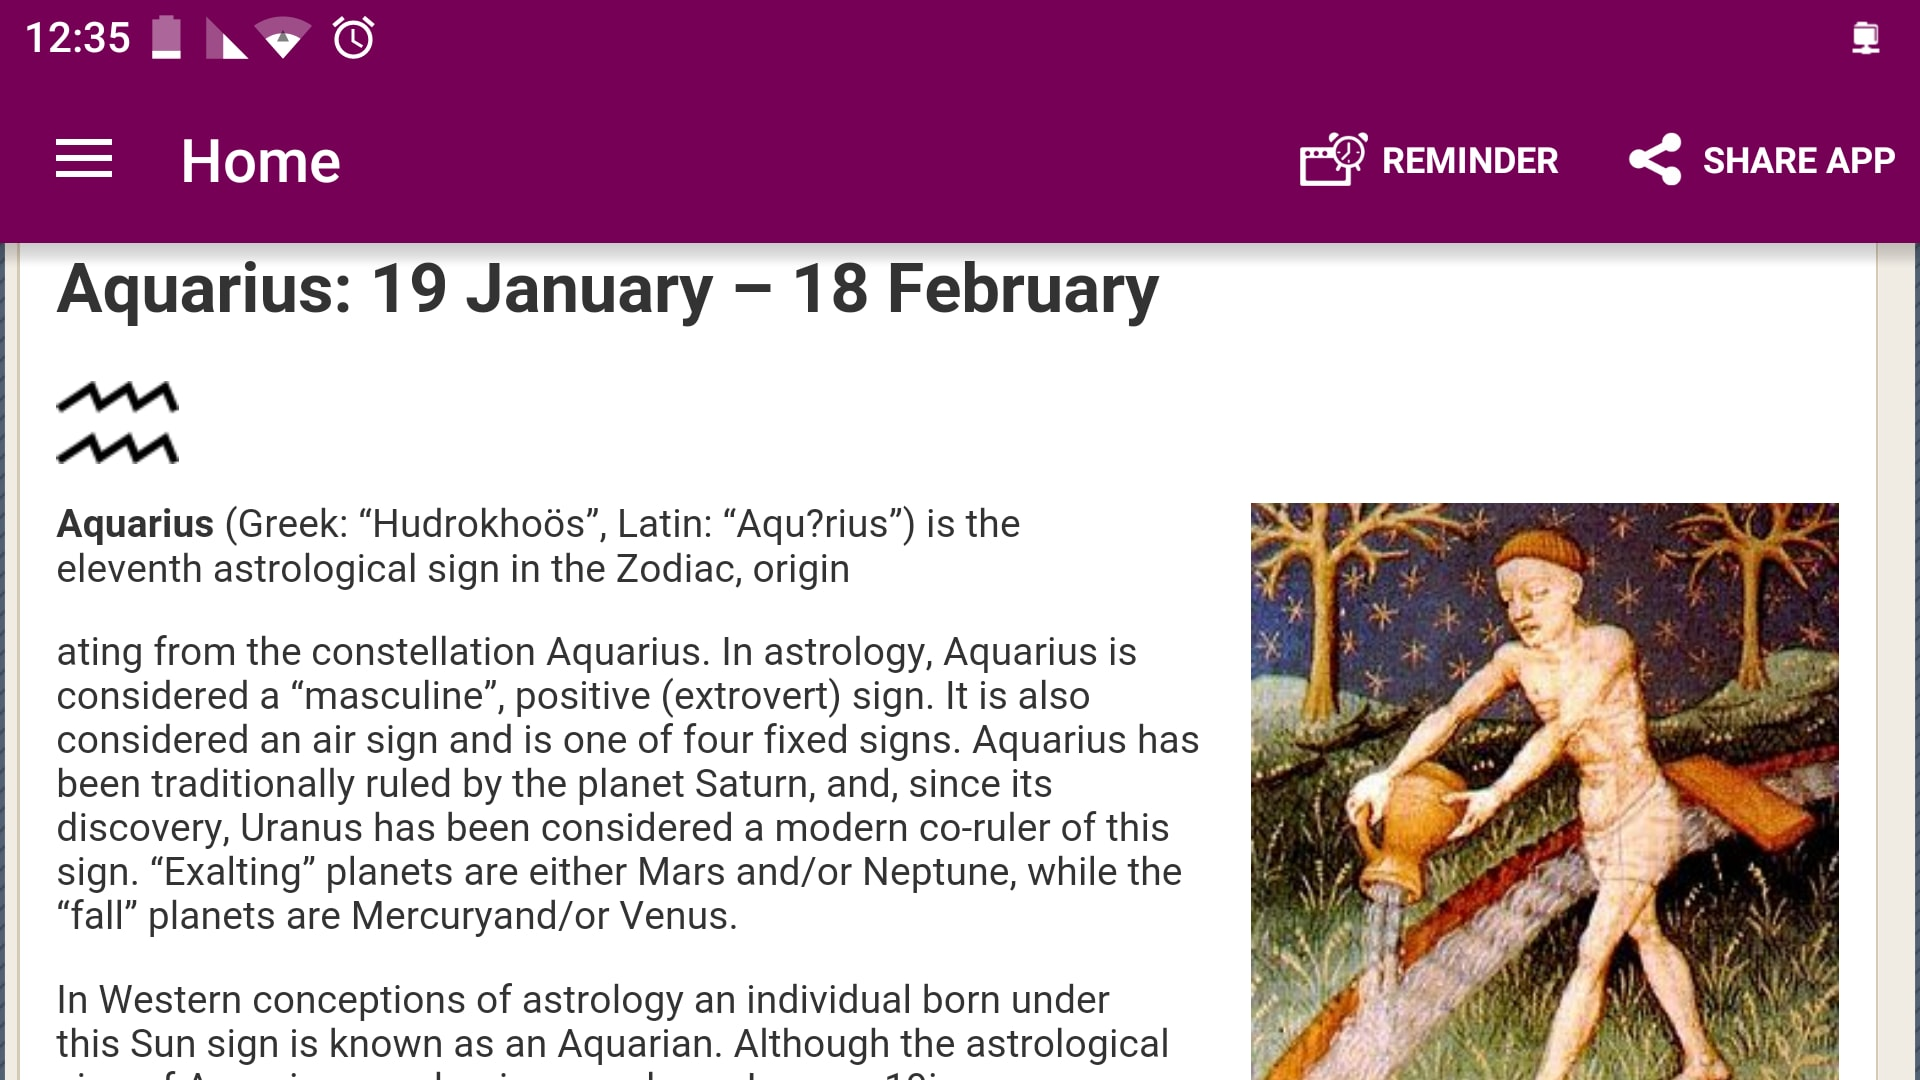 Aquarius Astrology & Horoscope